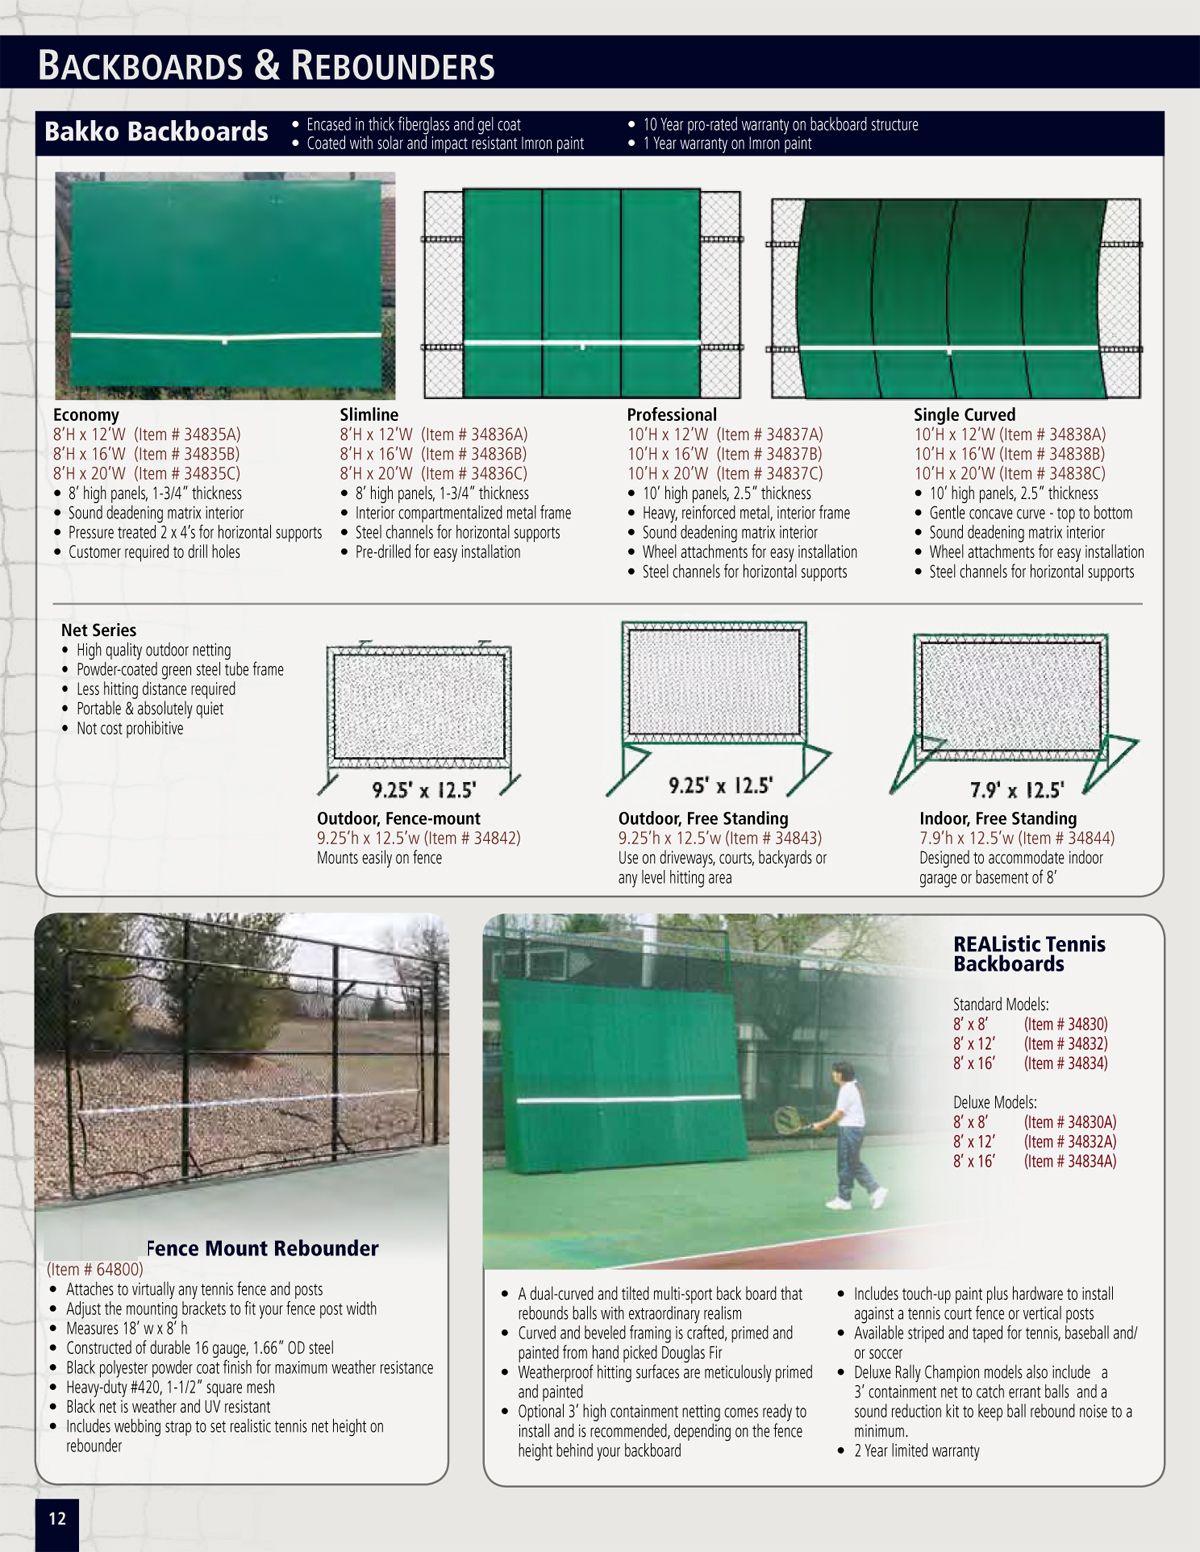 42+ Tennis practice wall diy inspirations